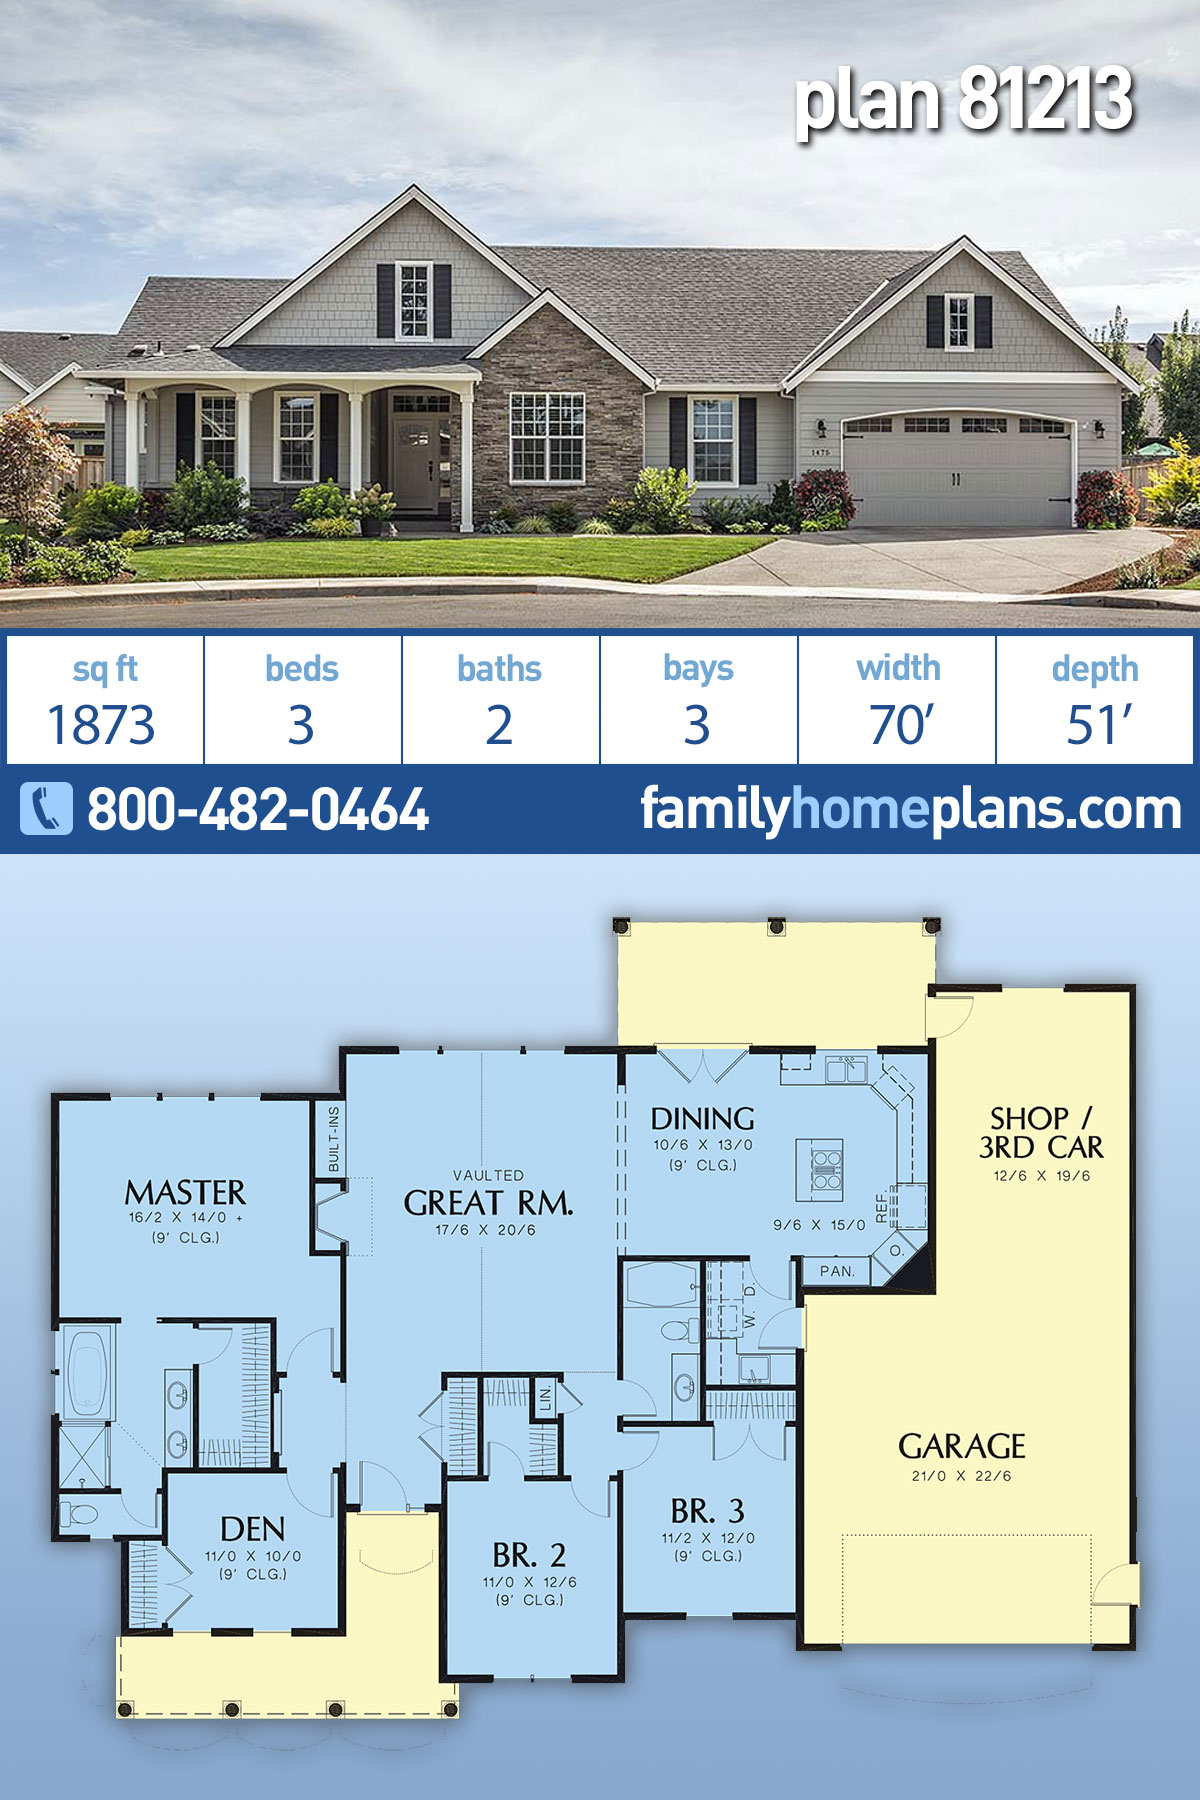 Craftsman, Ranch House Plan 81213 with 3 Beds, 2 Baths, 3 Car Garage